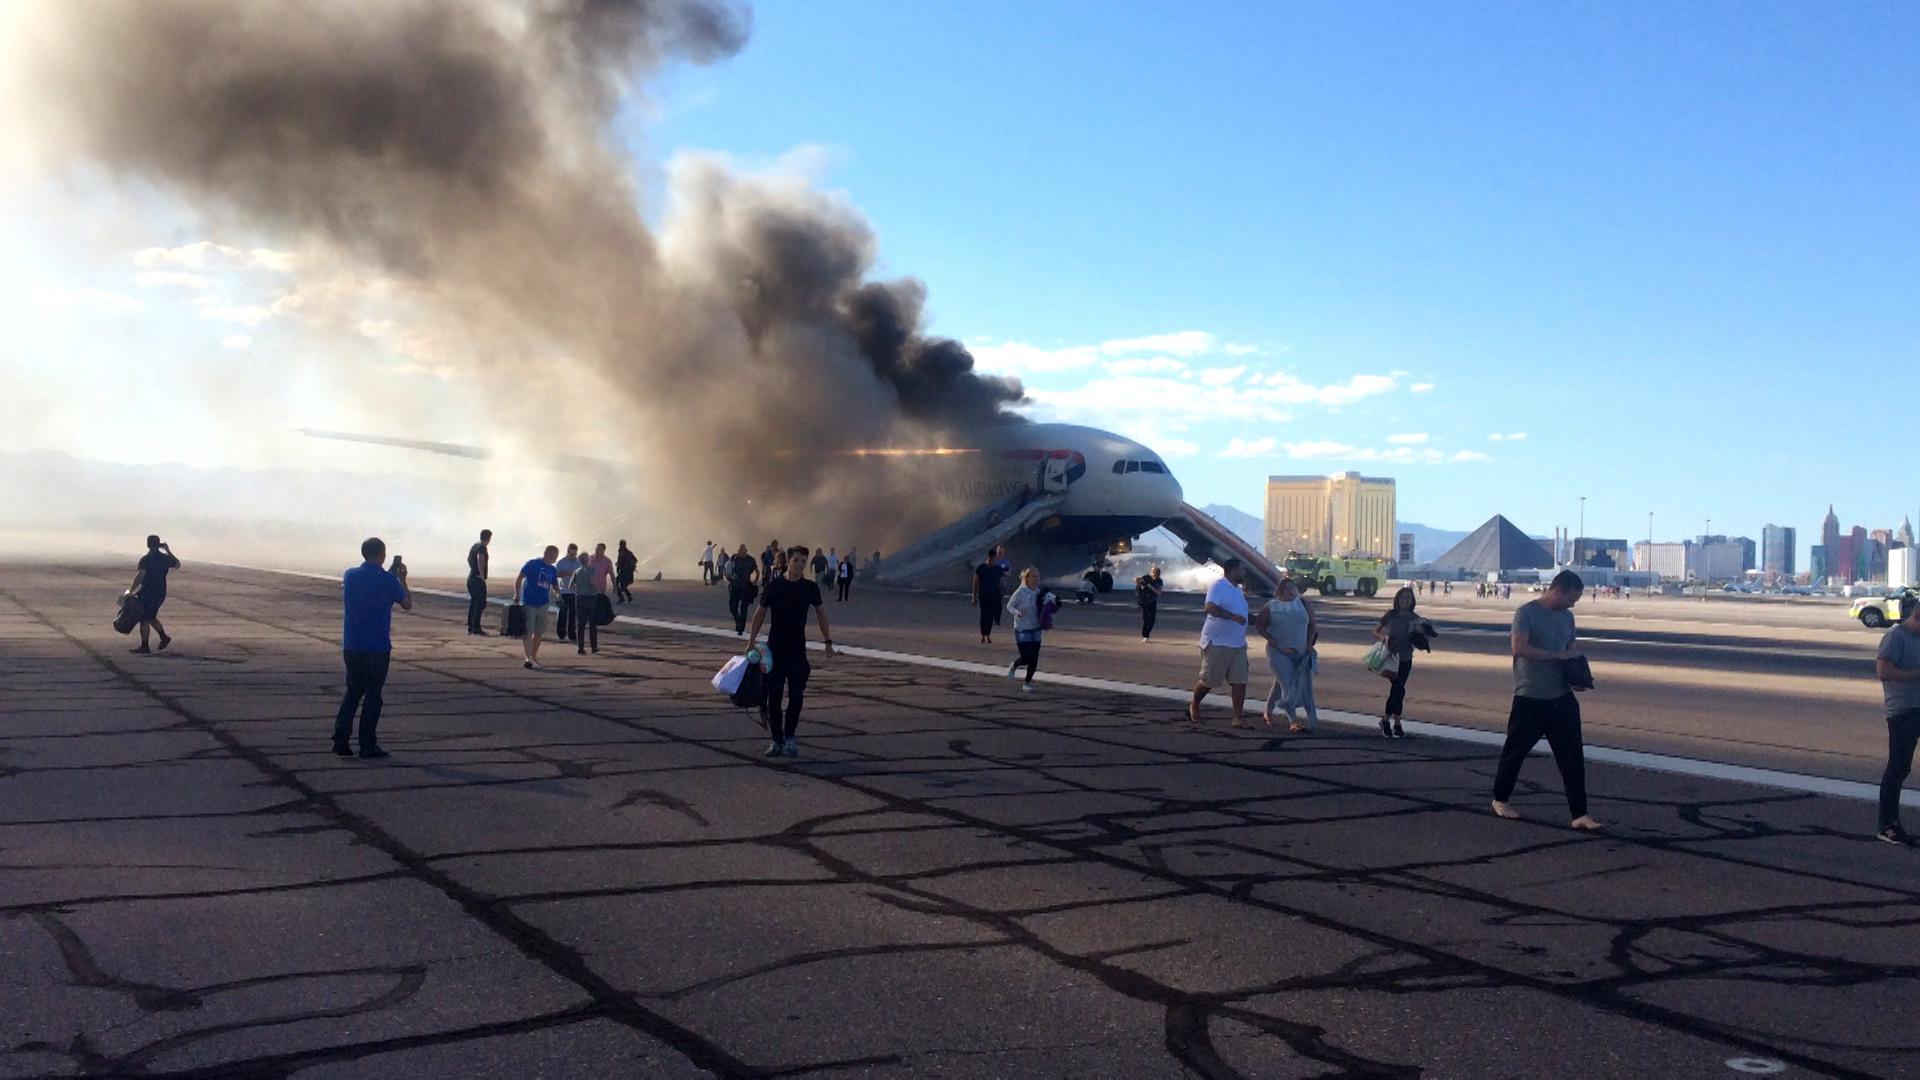 British Airways Jet Catches Fire at Las Vegas Airport; 20 Injured